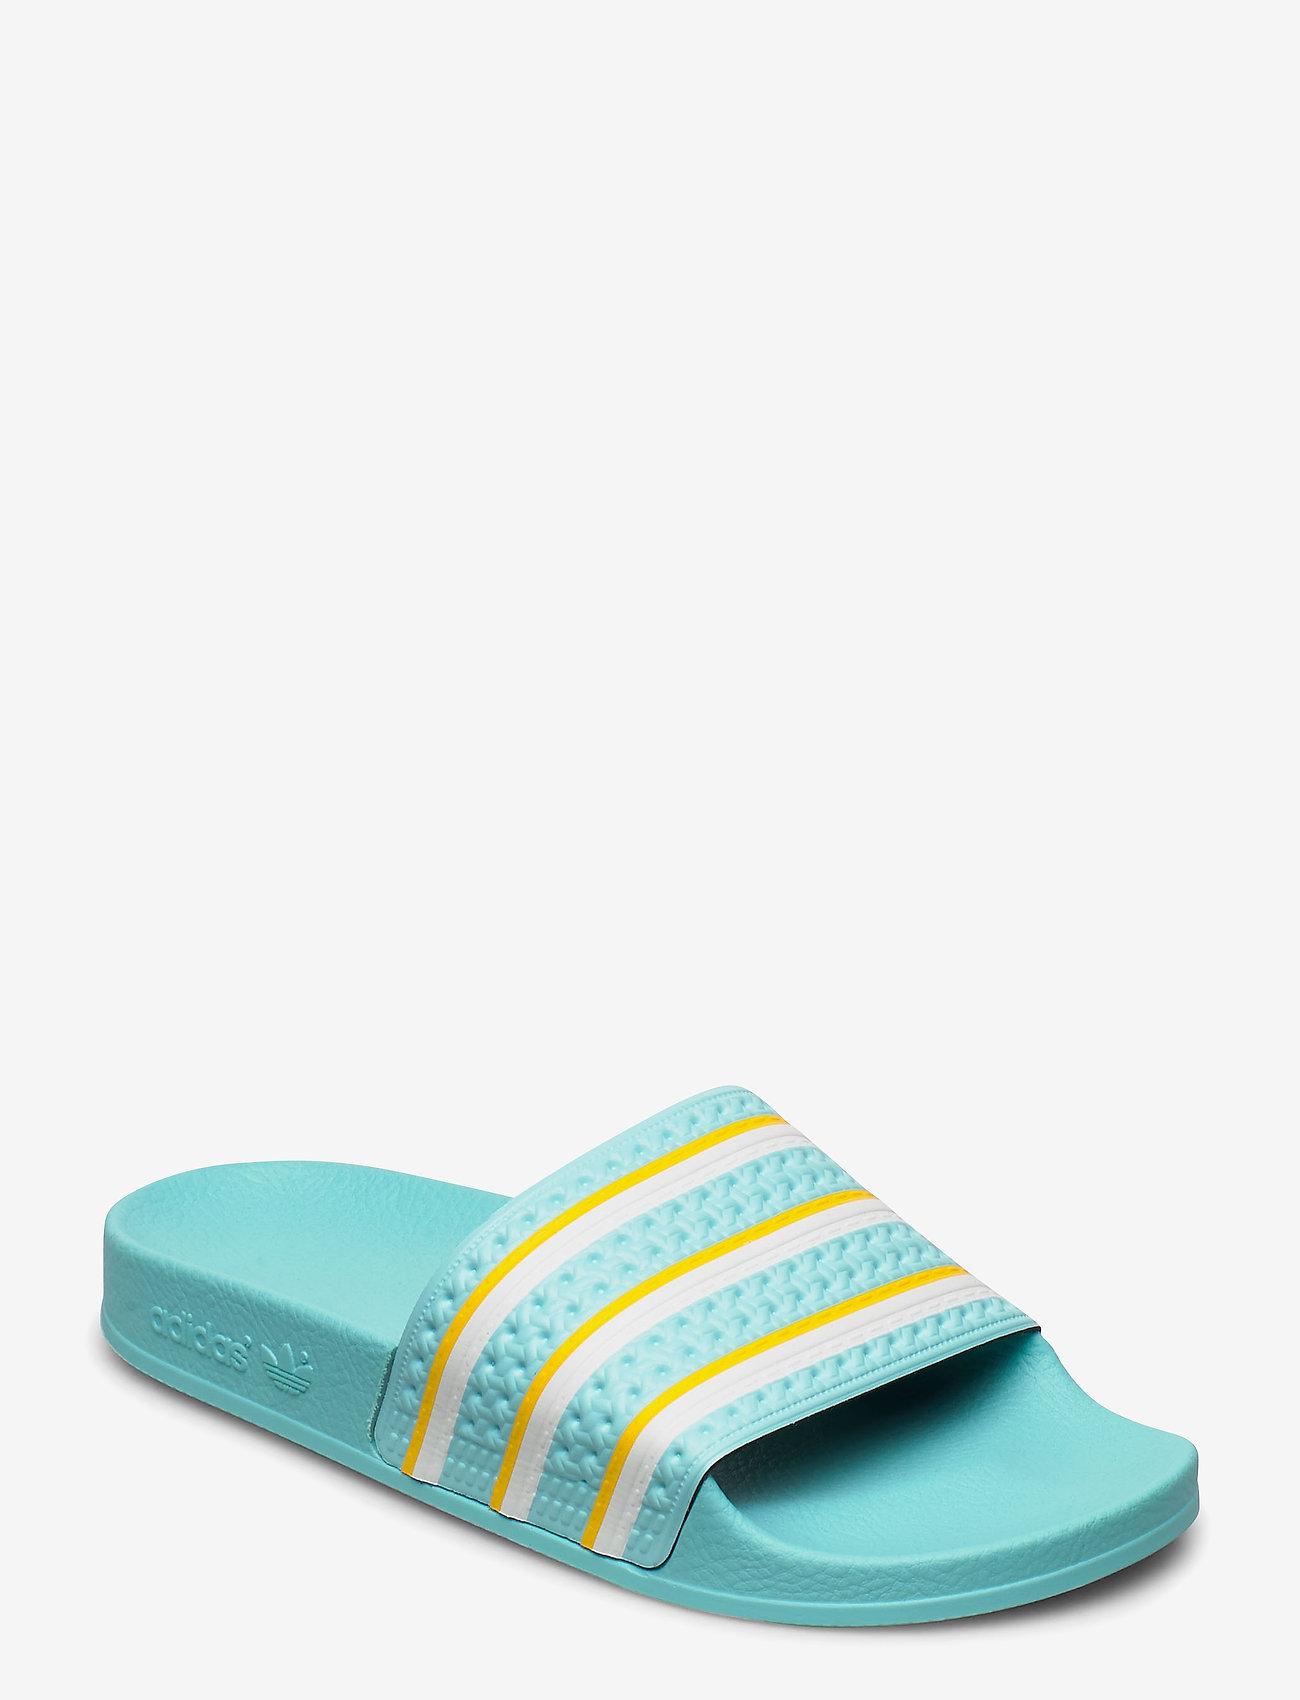 adidas Originals - ADILETTE - sneakers - bluzes/ftwwht/wonglo - 0